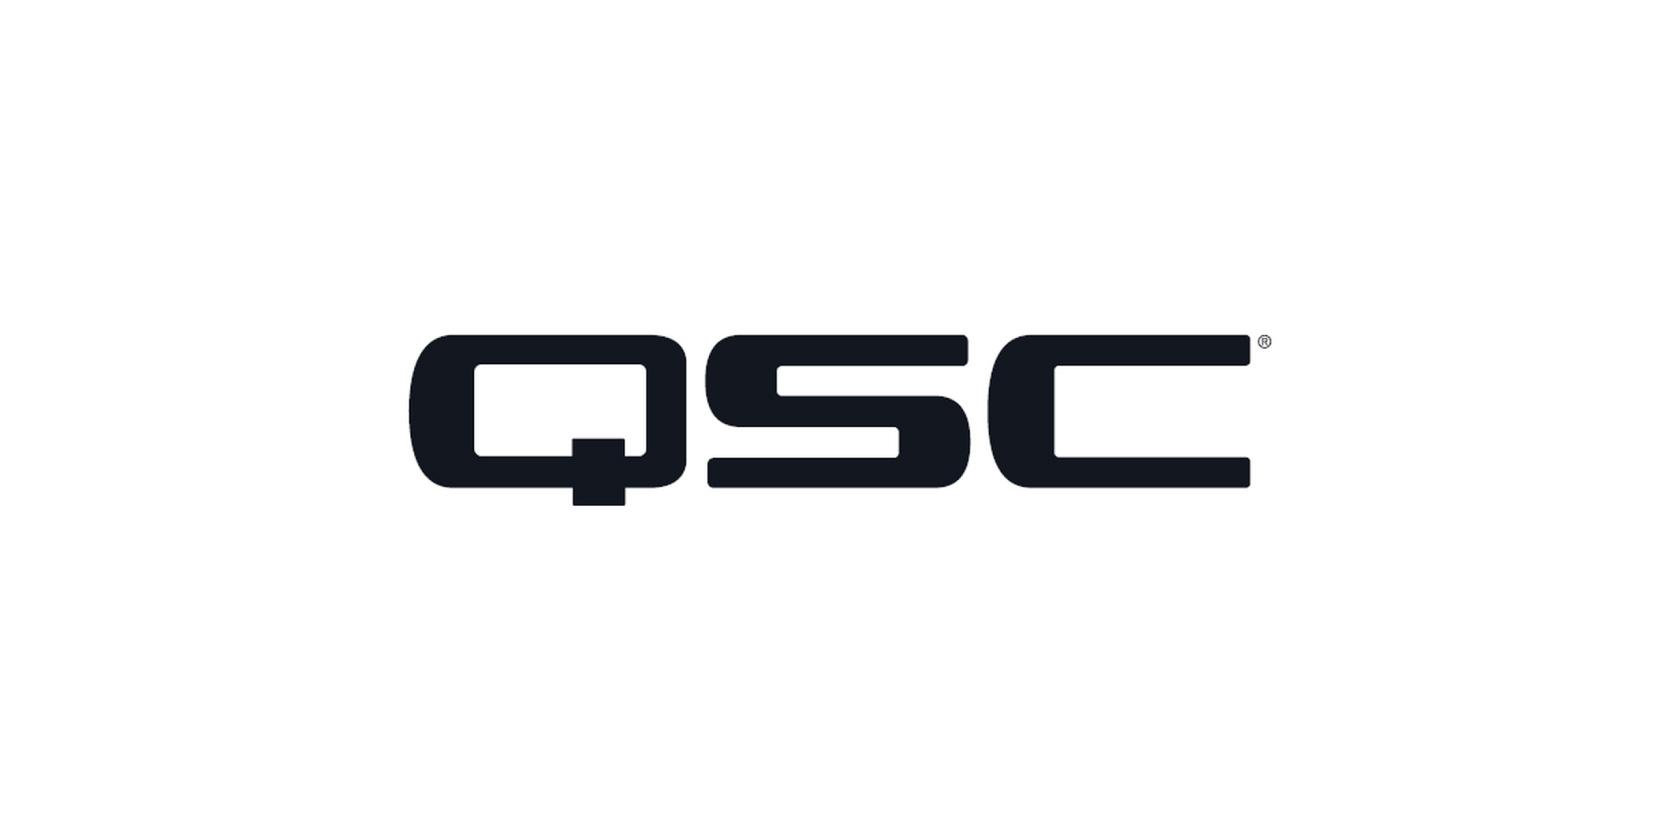 QSC company logo